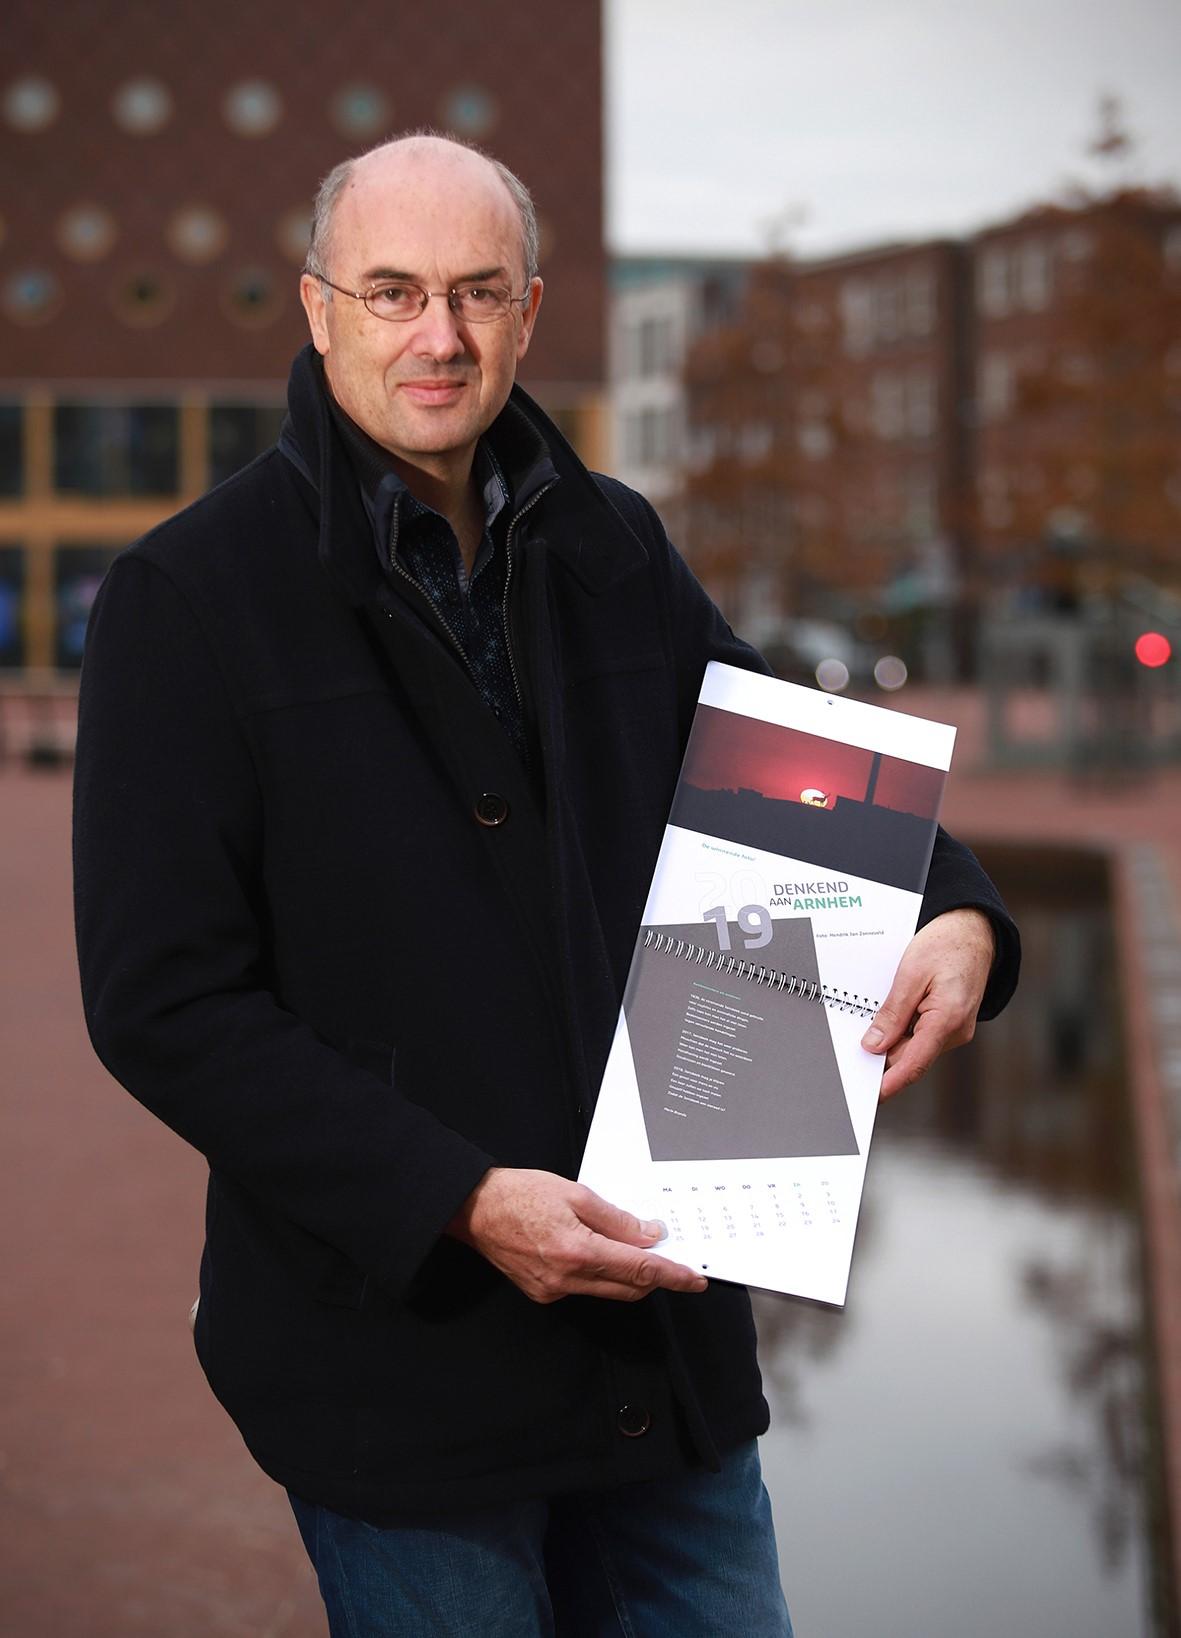 Denkend aan Arnhem, foto Rens Plaschek